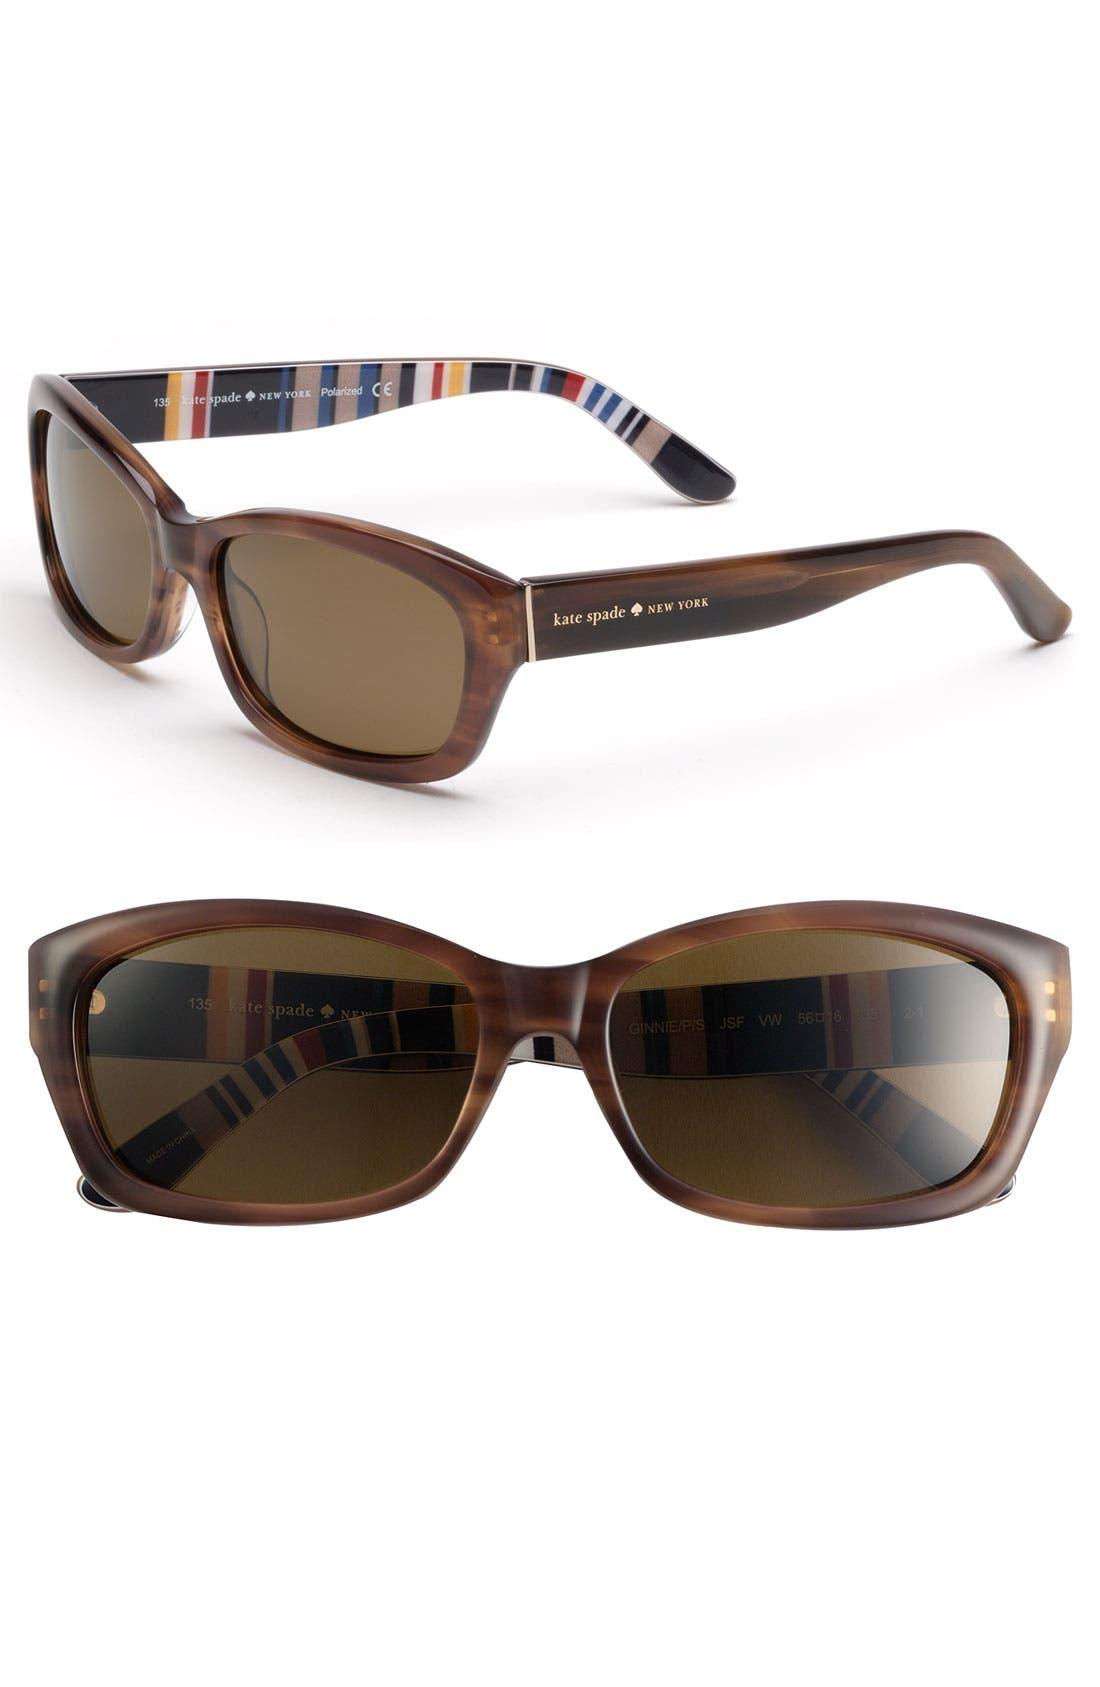 Alternate Image 1 Selected - kate spade new york 'ginnie' polarized sunglasses